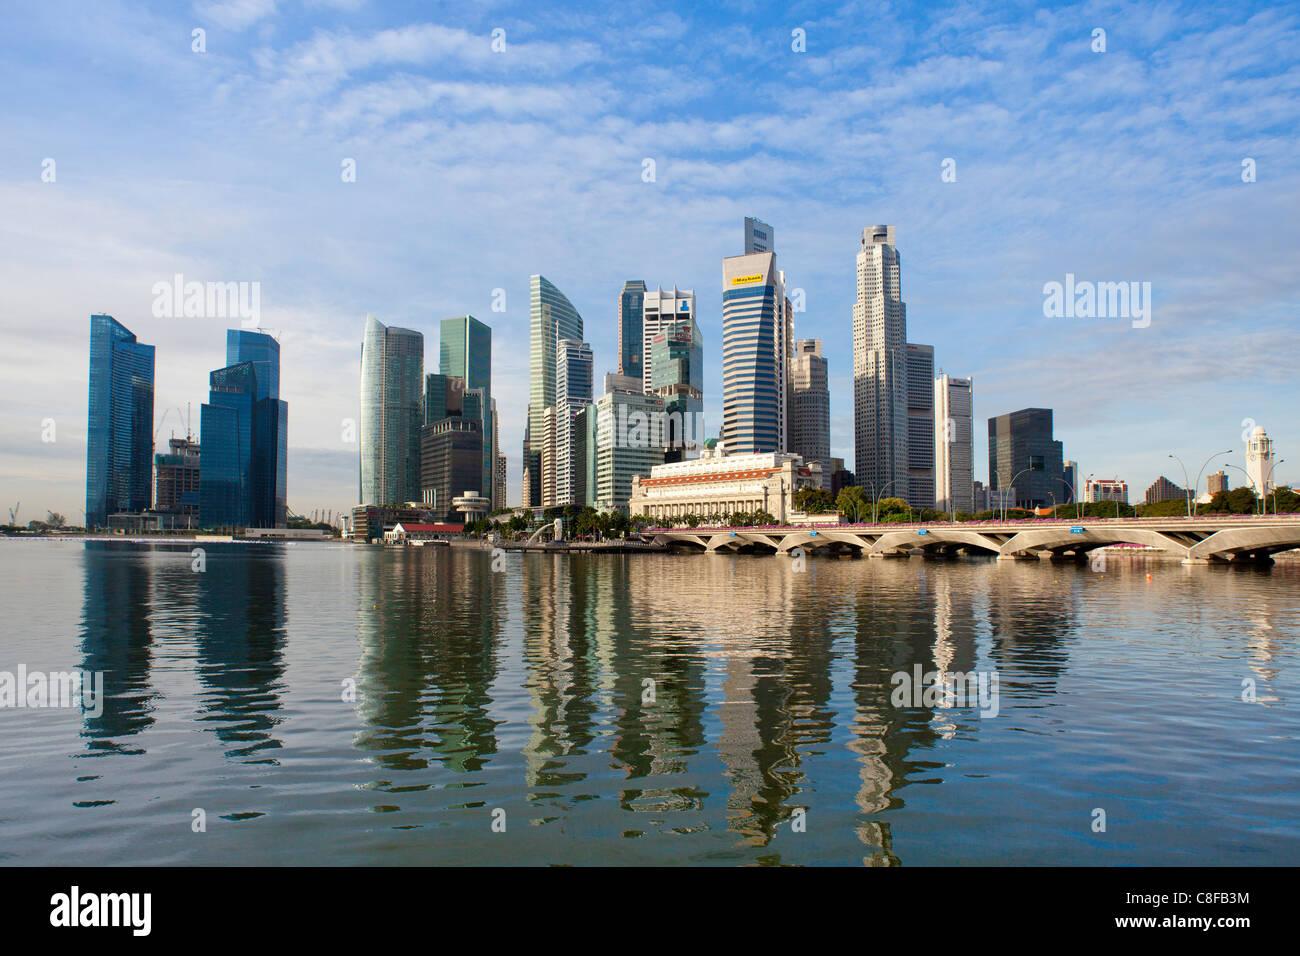 Singapore, Asia, Downtown, Skyline, blocks of flats, high-rise buildings, skyscrapers, shores, bridge, sea, bay - Stock Image